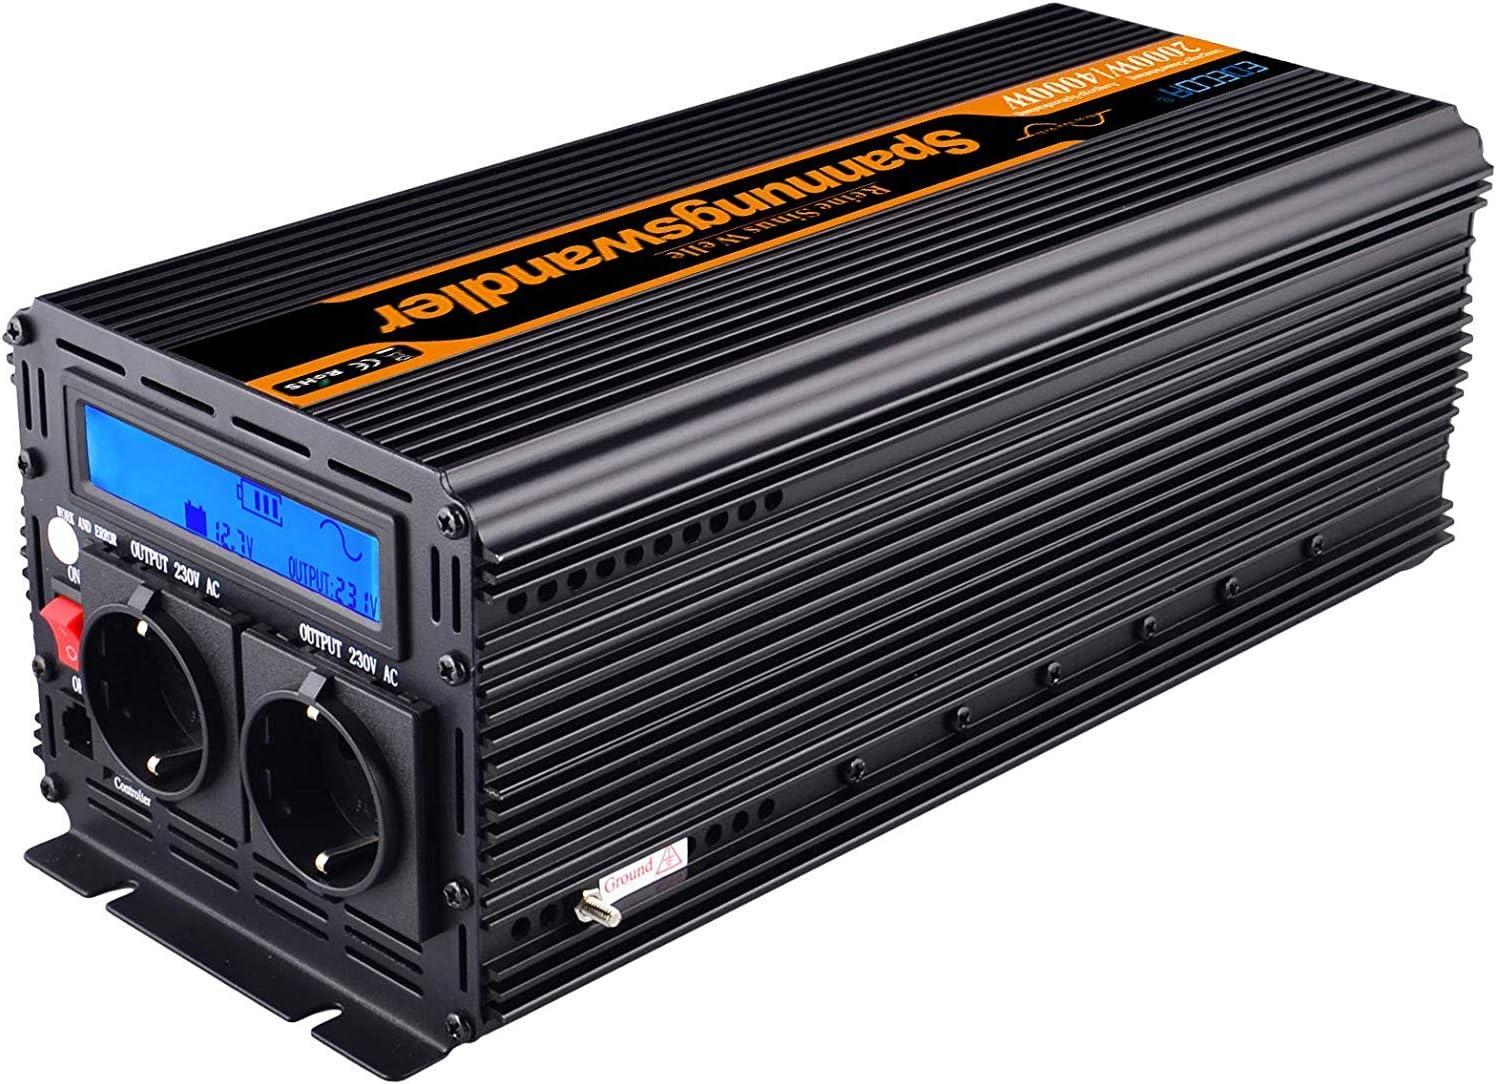 EDECOA Conversor onda pura 2000w Inversor 24v 220v con pantalla LCD 2x USB y mando a distancia Transformador para camion 2000w y pico momentaneo de 4000w